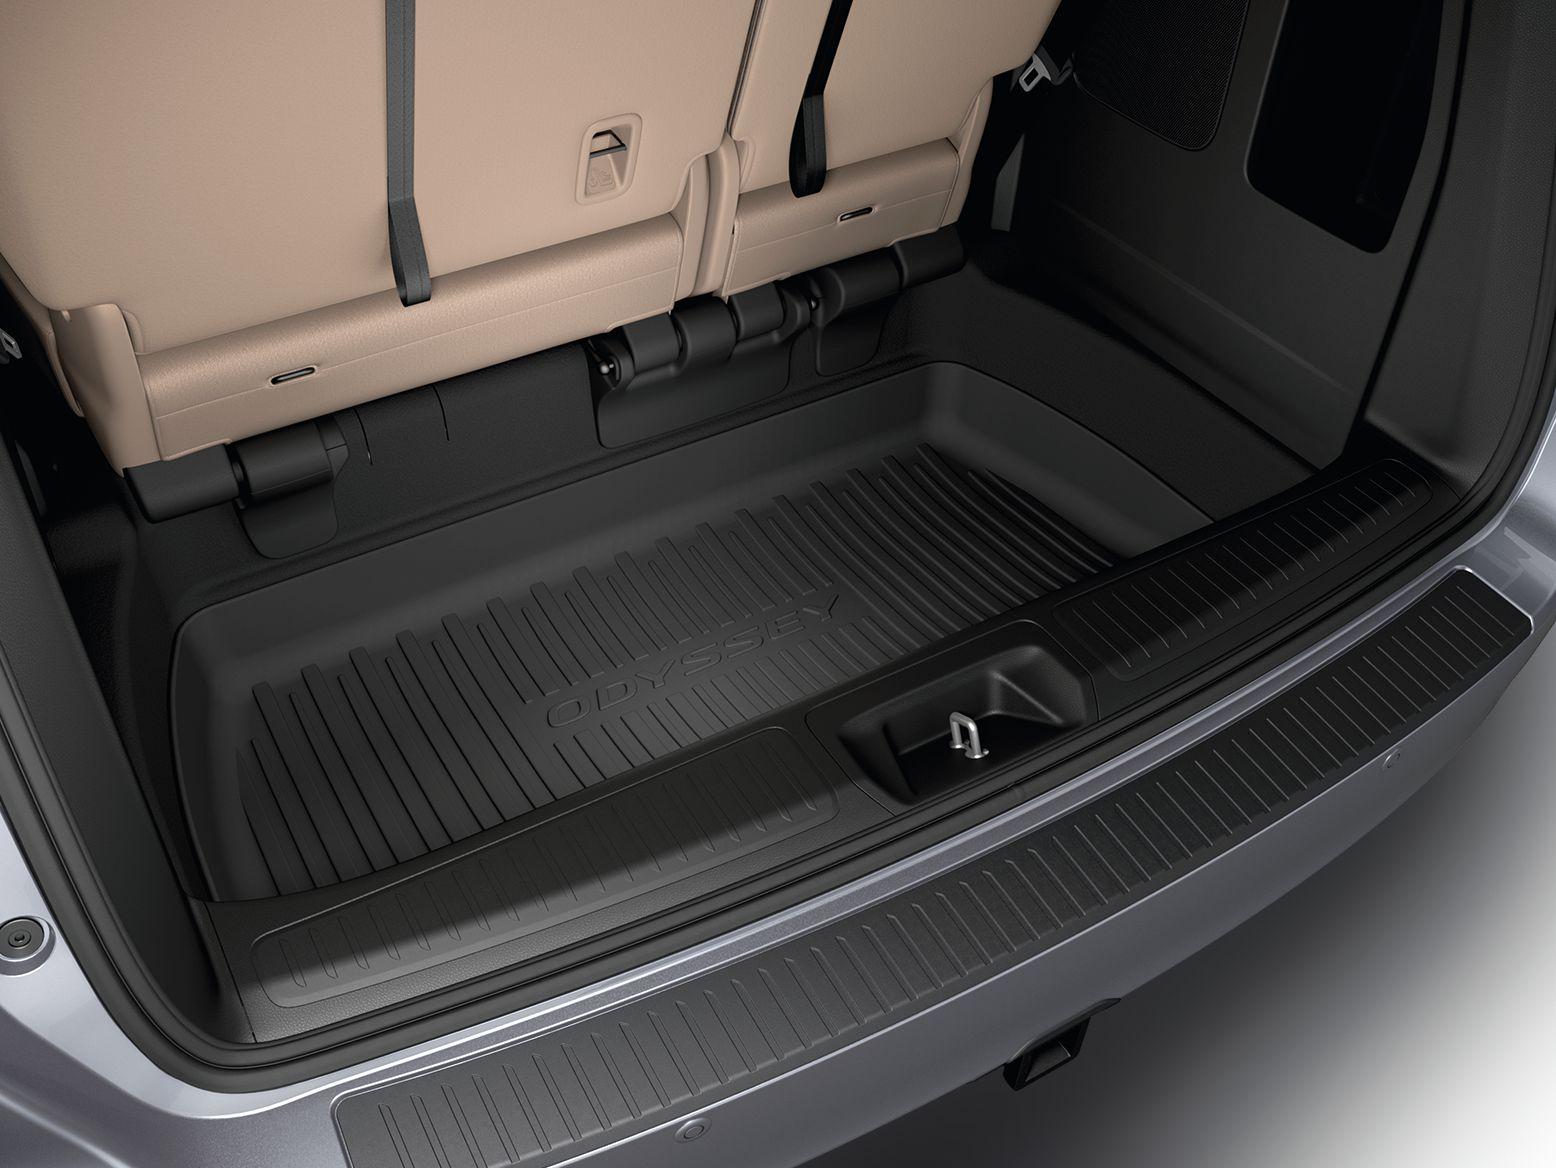 Honda online store : 2018 ODYSSEY CARGO TRAY DEEP